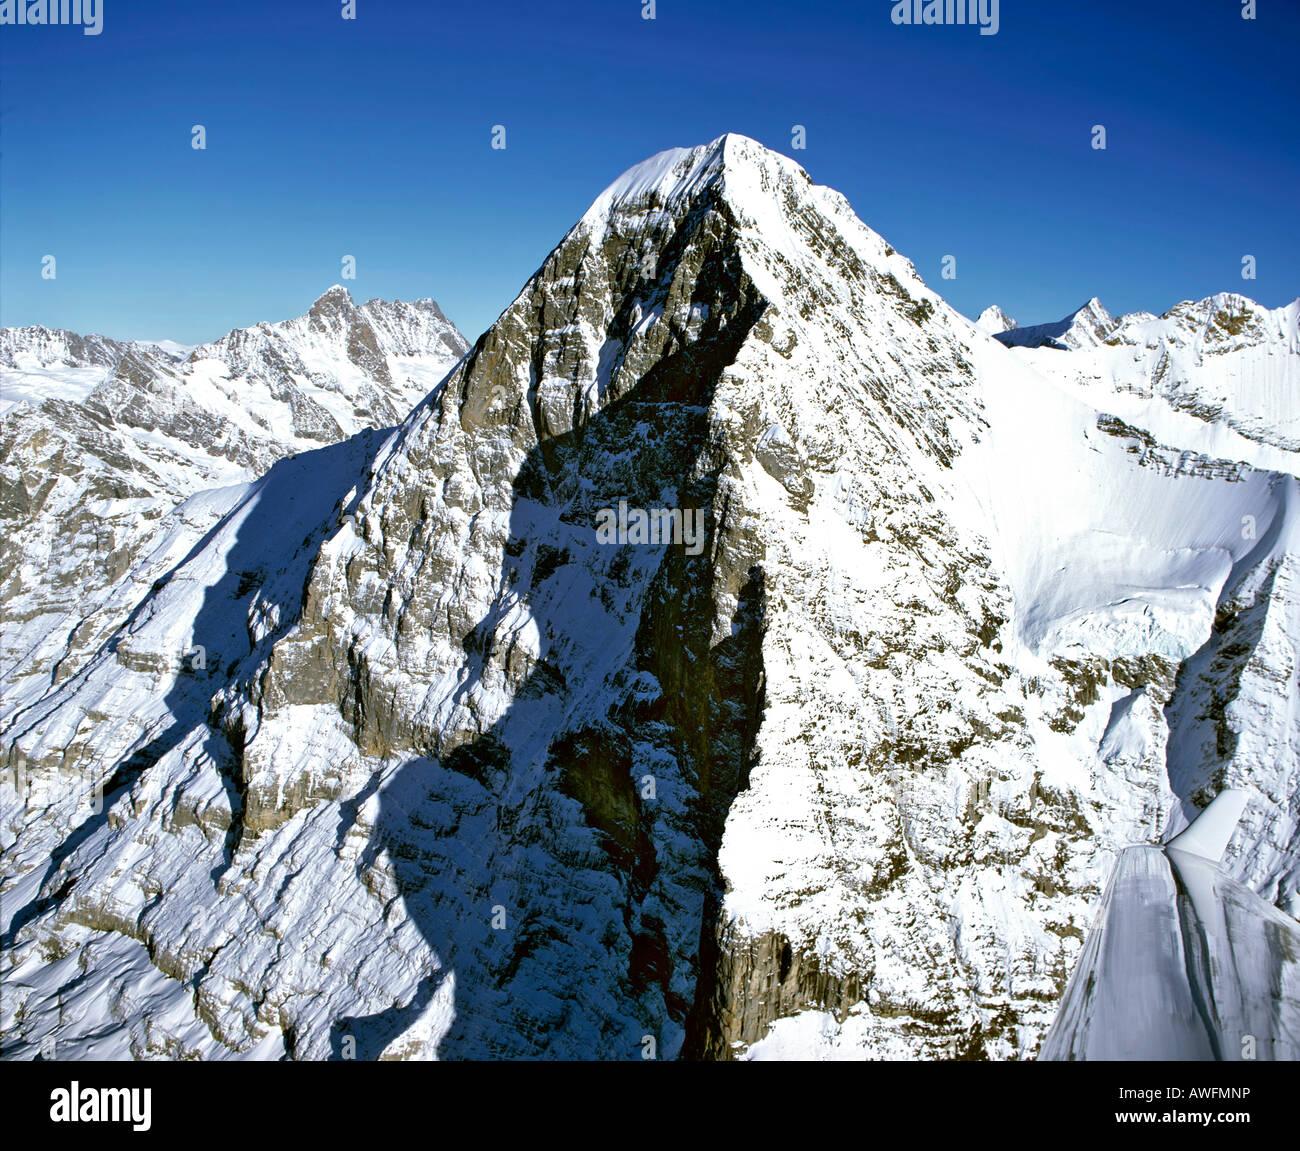 Aerial shot, north face of Mt. Eiger, Bernese Alps, Bernese Oberland (Highlands), Switzerland, Europe - Stock Image